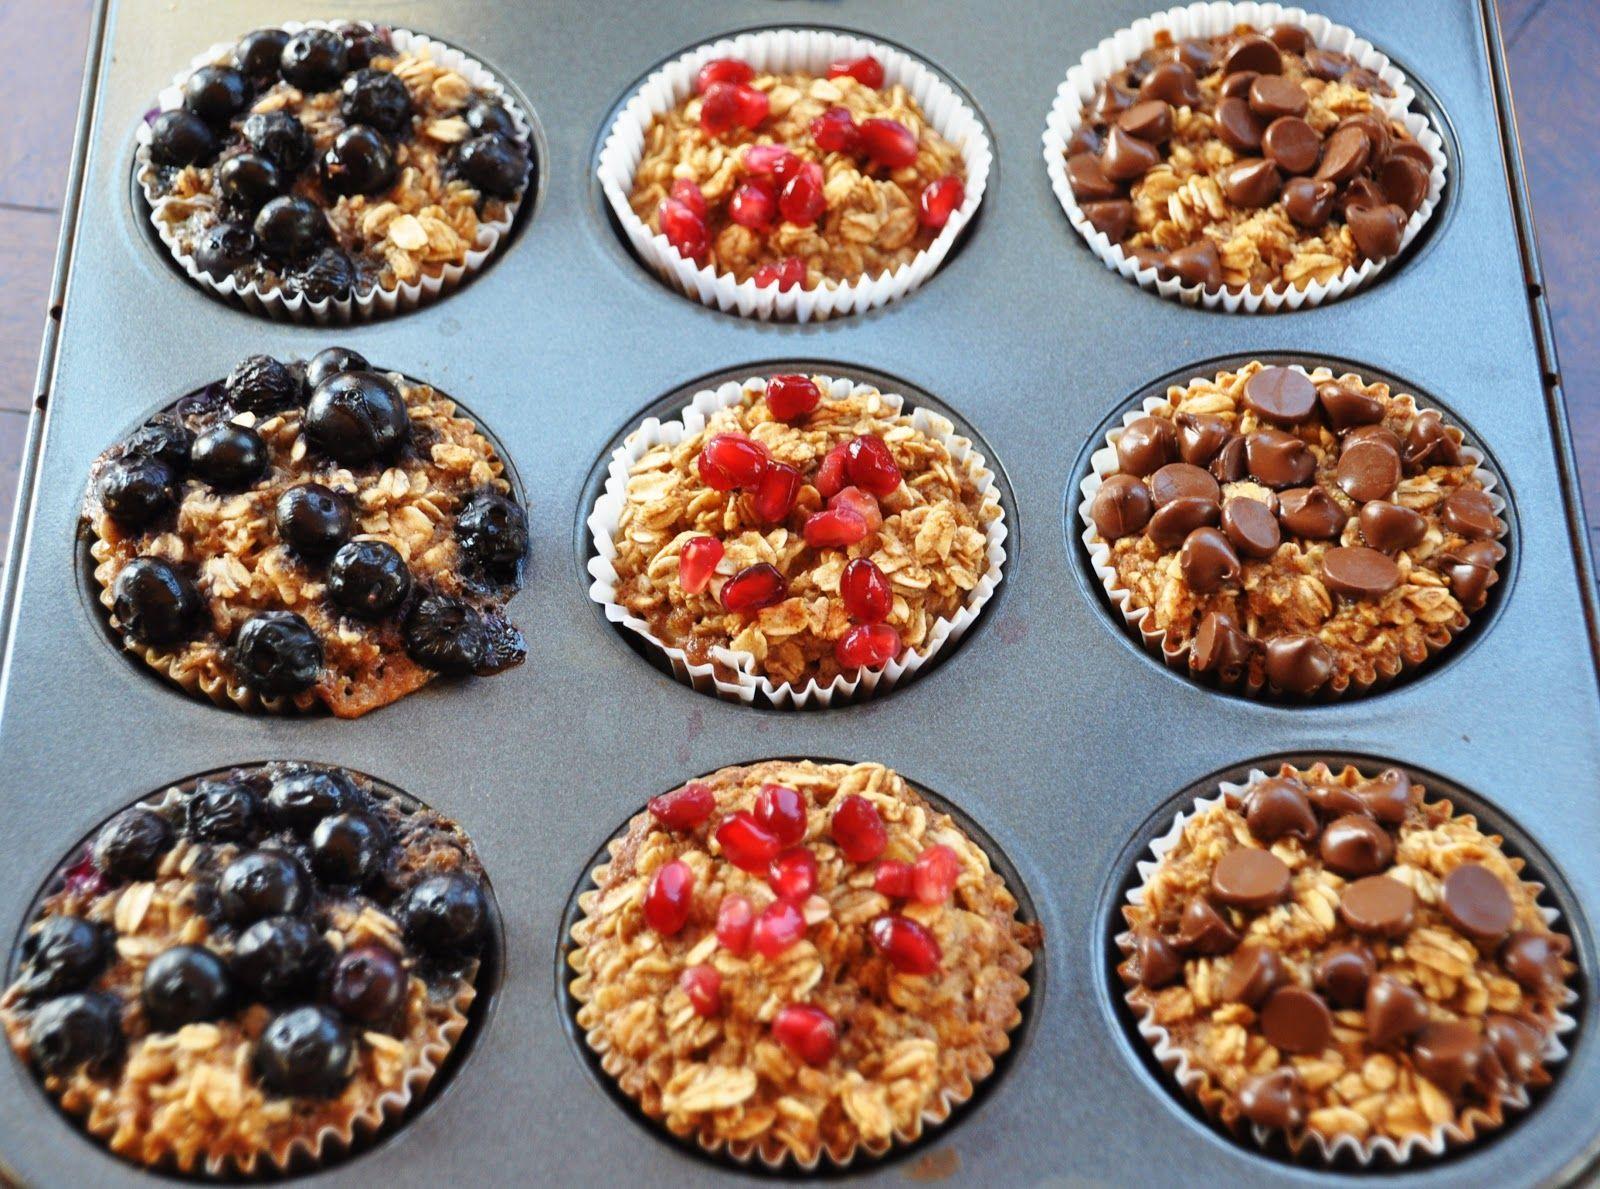 how to make oatmeal 2 servings